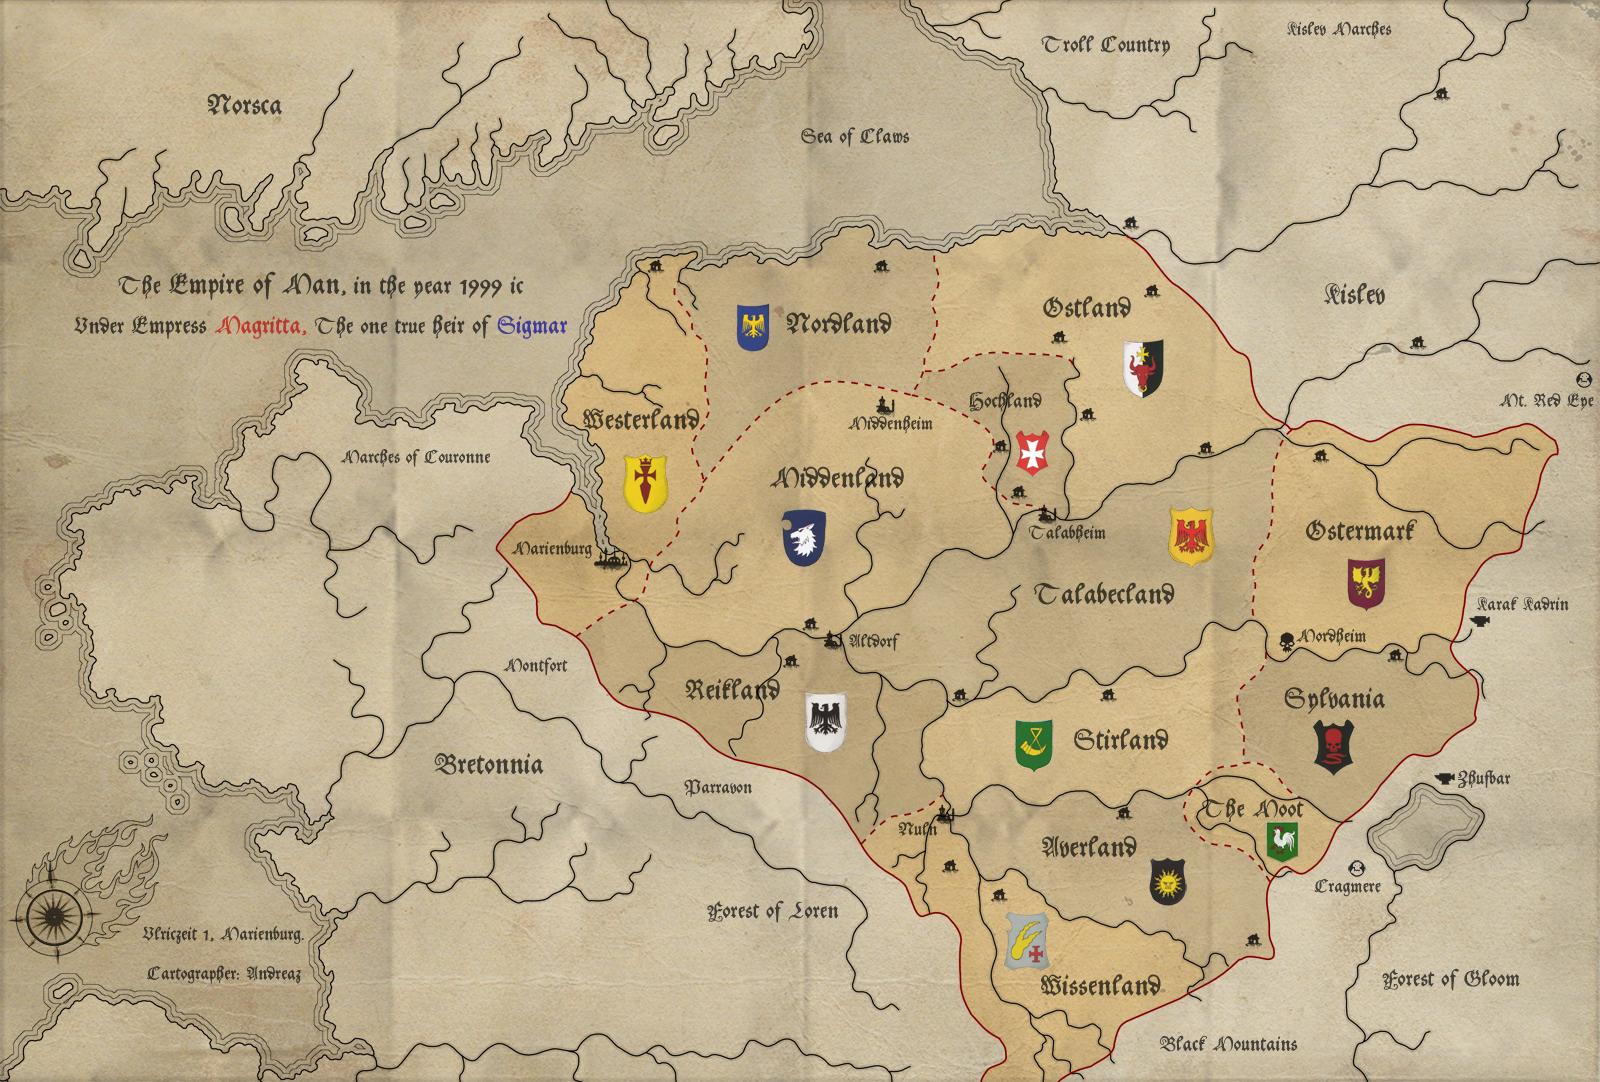 Warhammer cartography and maps | Warhammer | Pinterest | Cartography ...